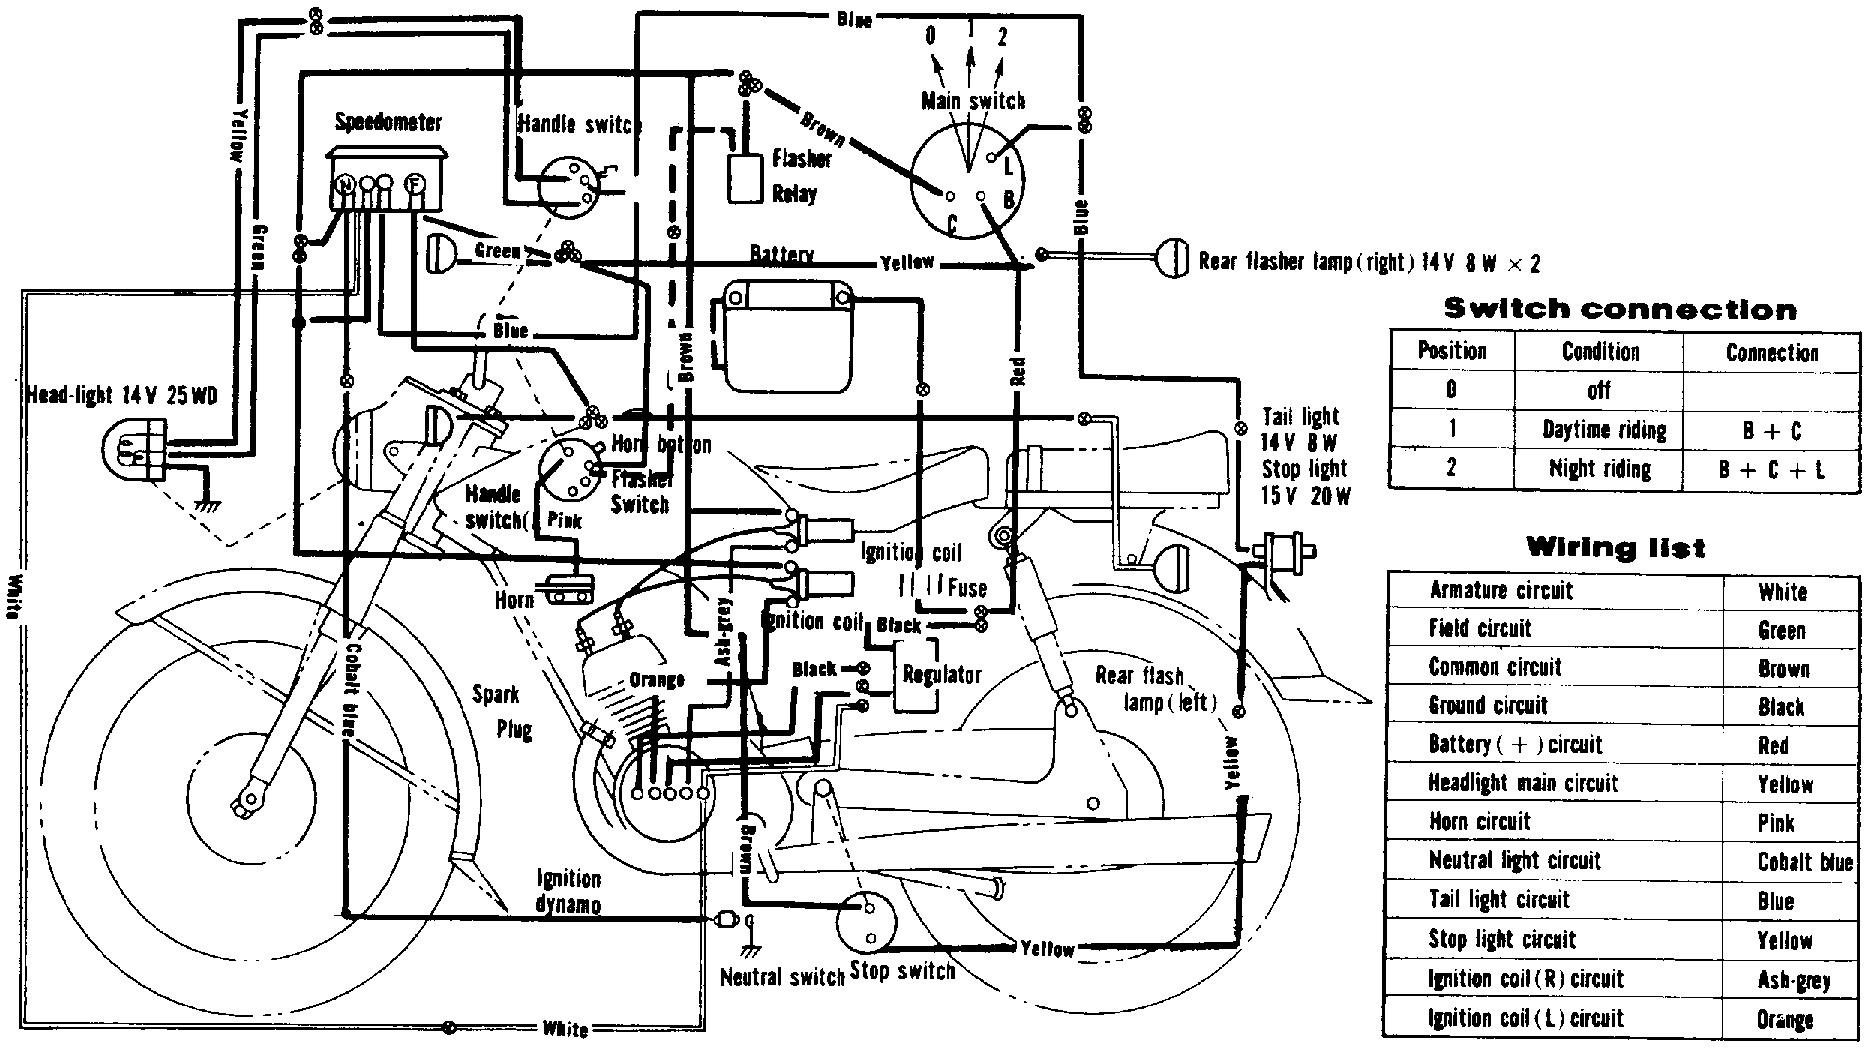 L1 Electrical Diagram